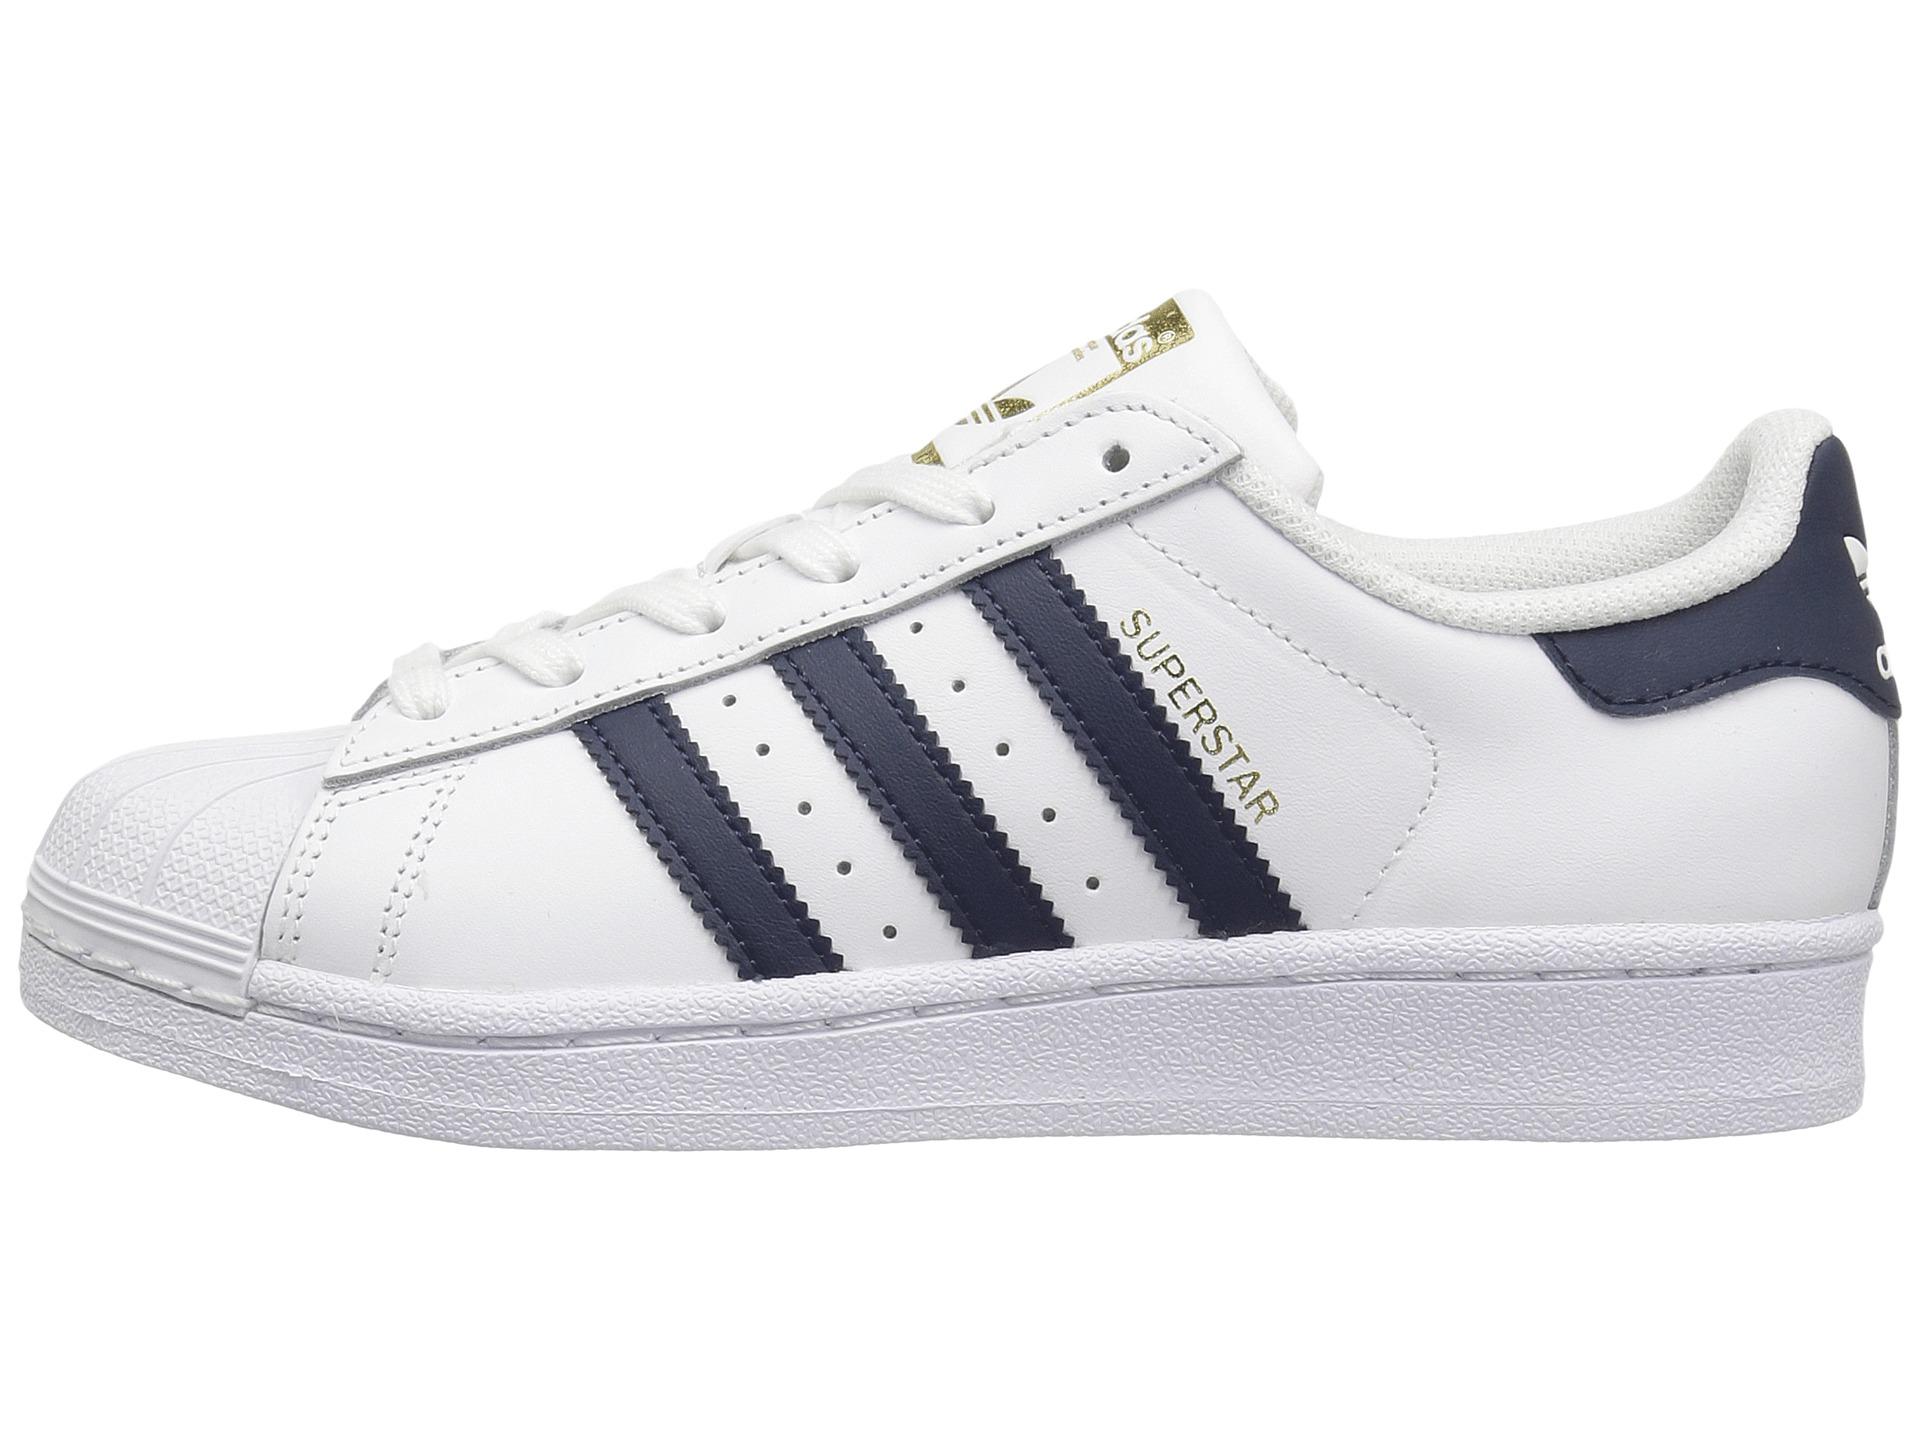 Adidas Original Kids